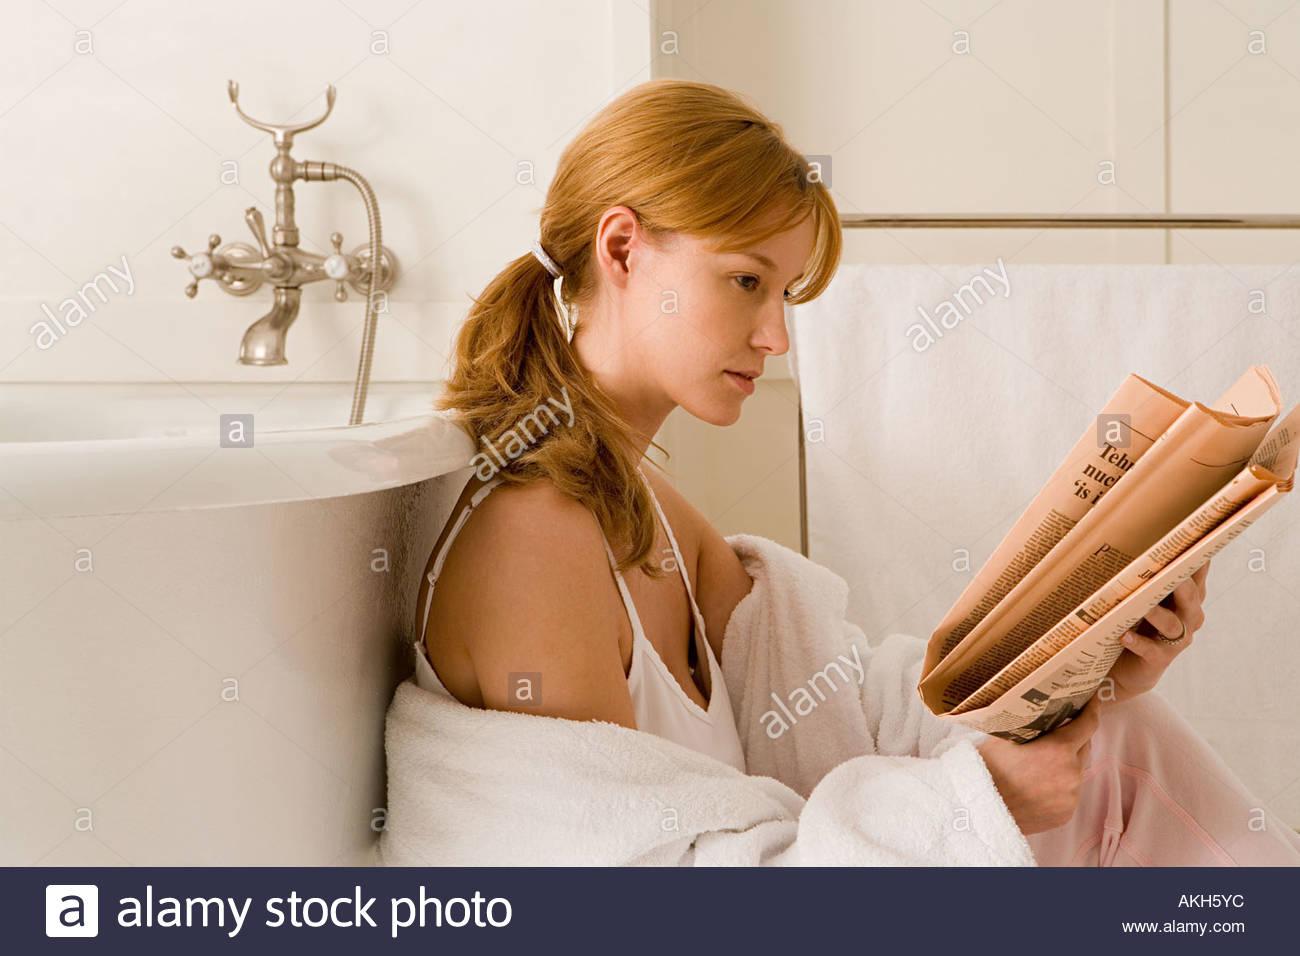 Woman reading newspaper in bathroom - Stock Image